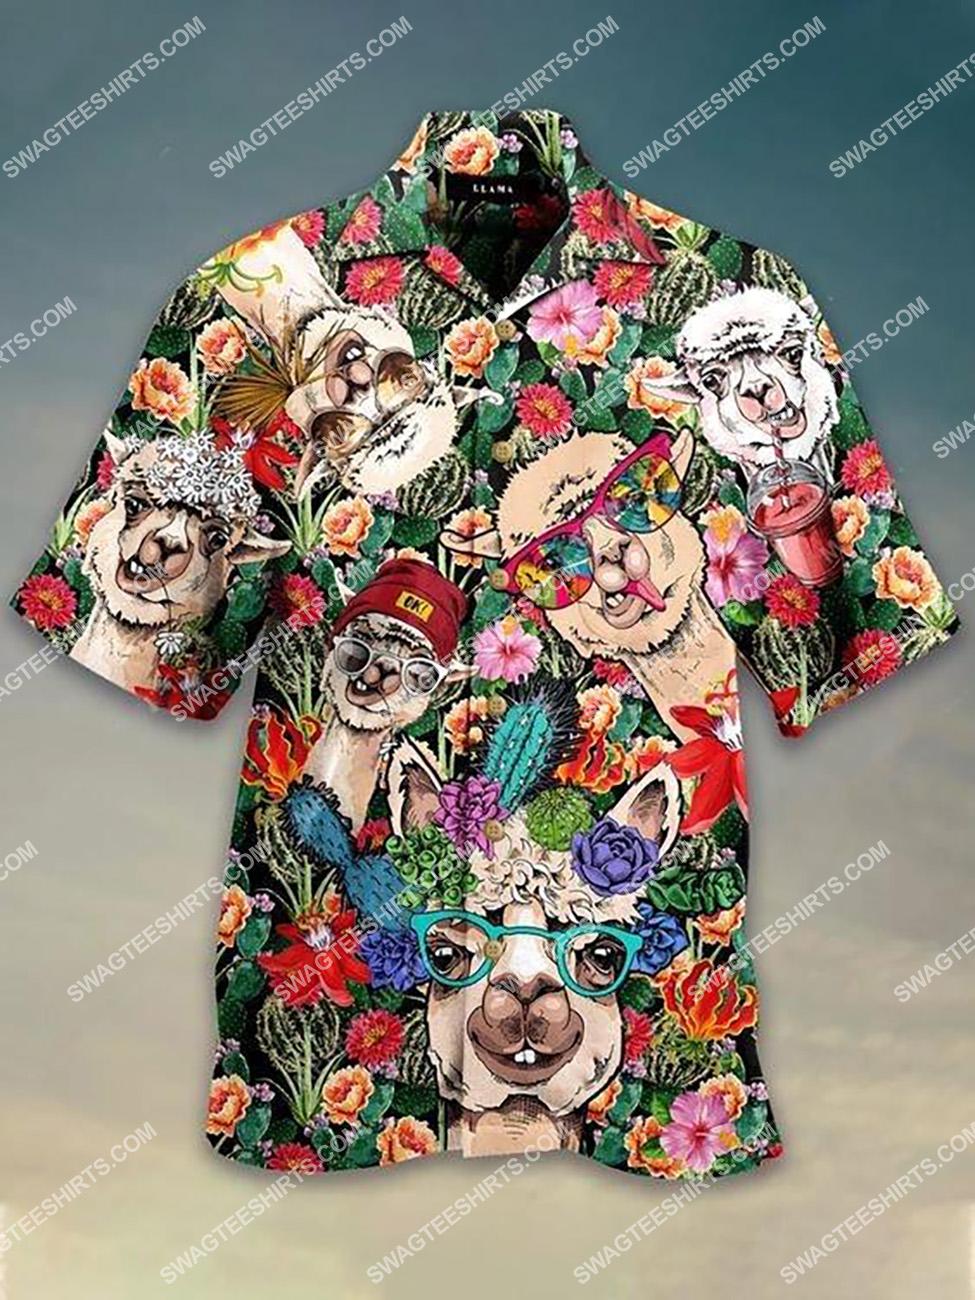 the tropical llama lover all over printed hawaiian shirt 1(1) - Copy